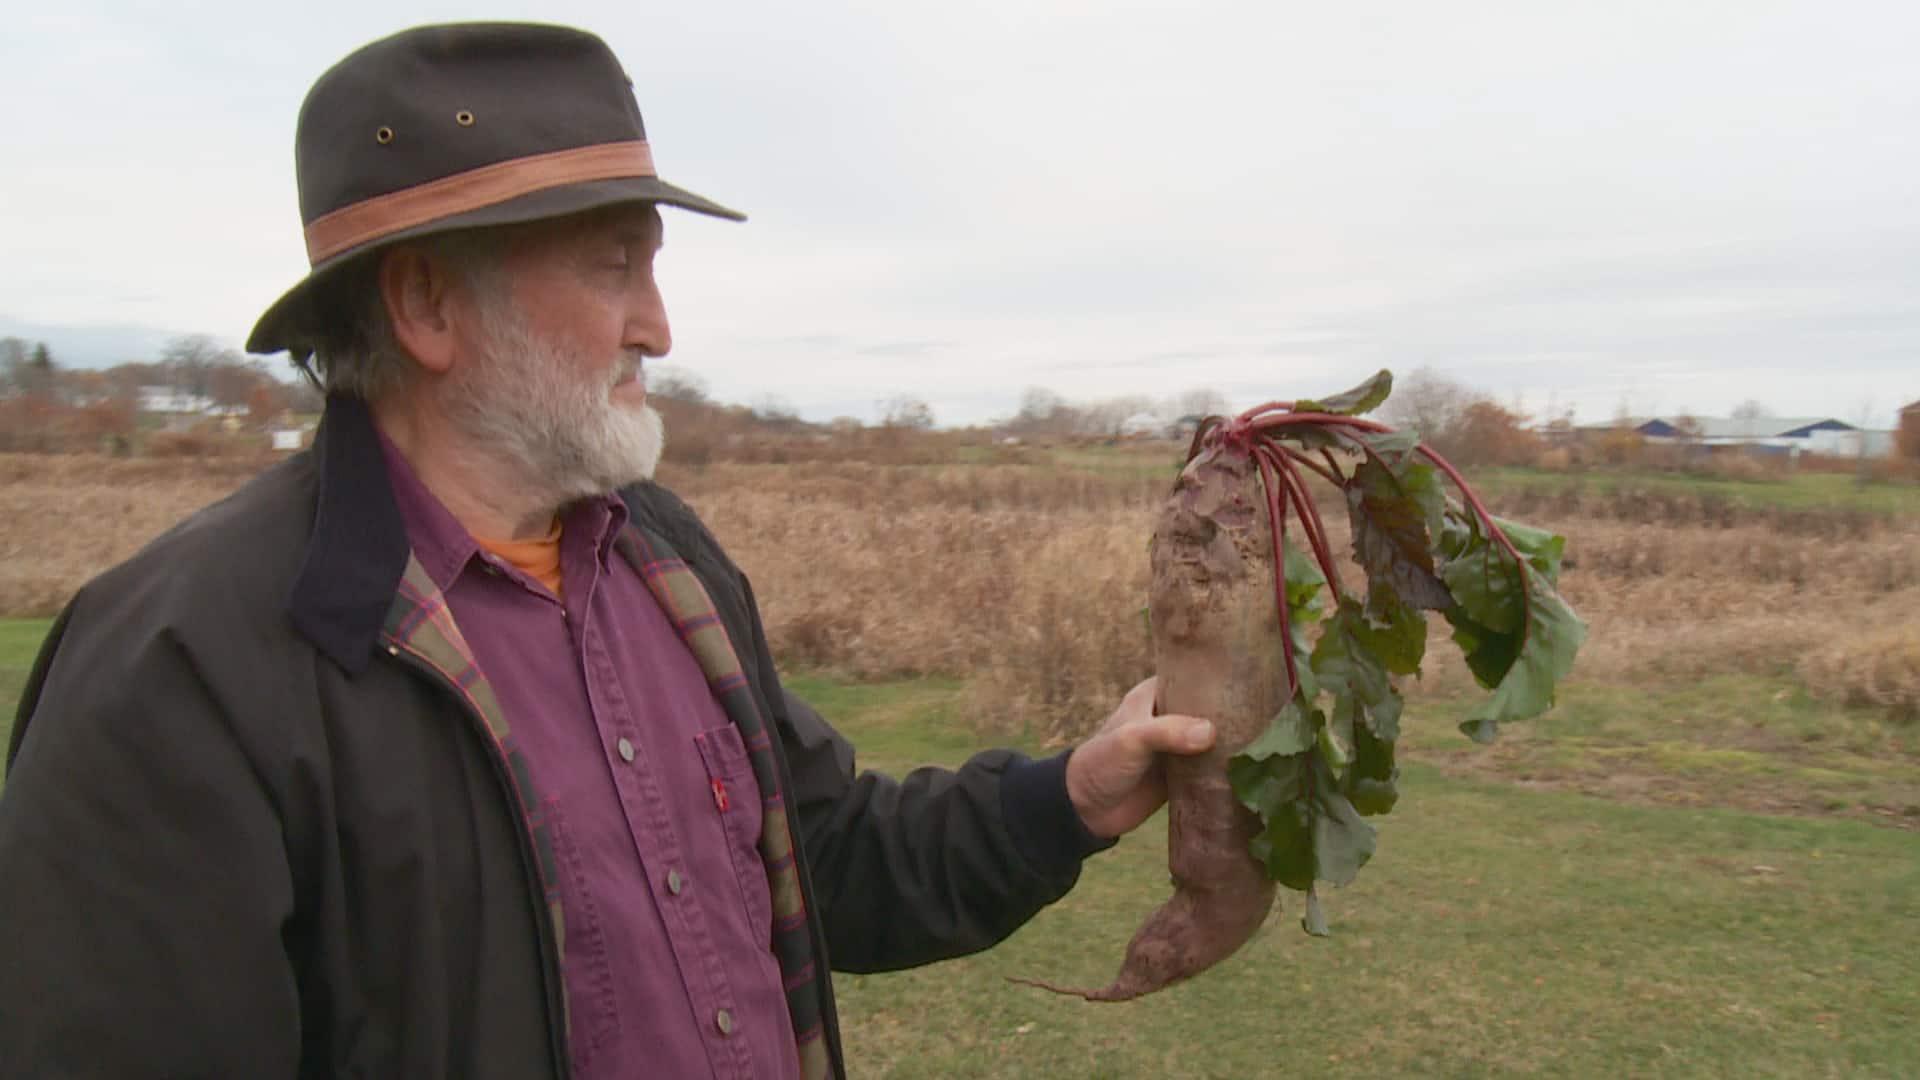 P.E.I. man Develops humongous beet, enough for'10 Foods' thumbnail